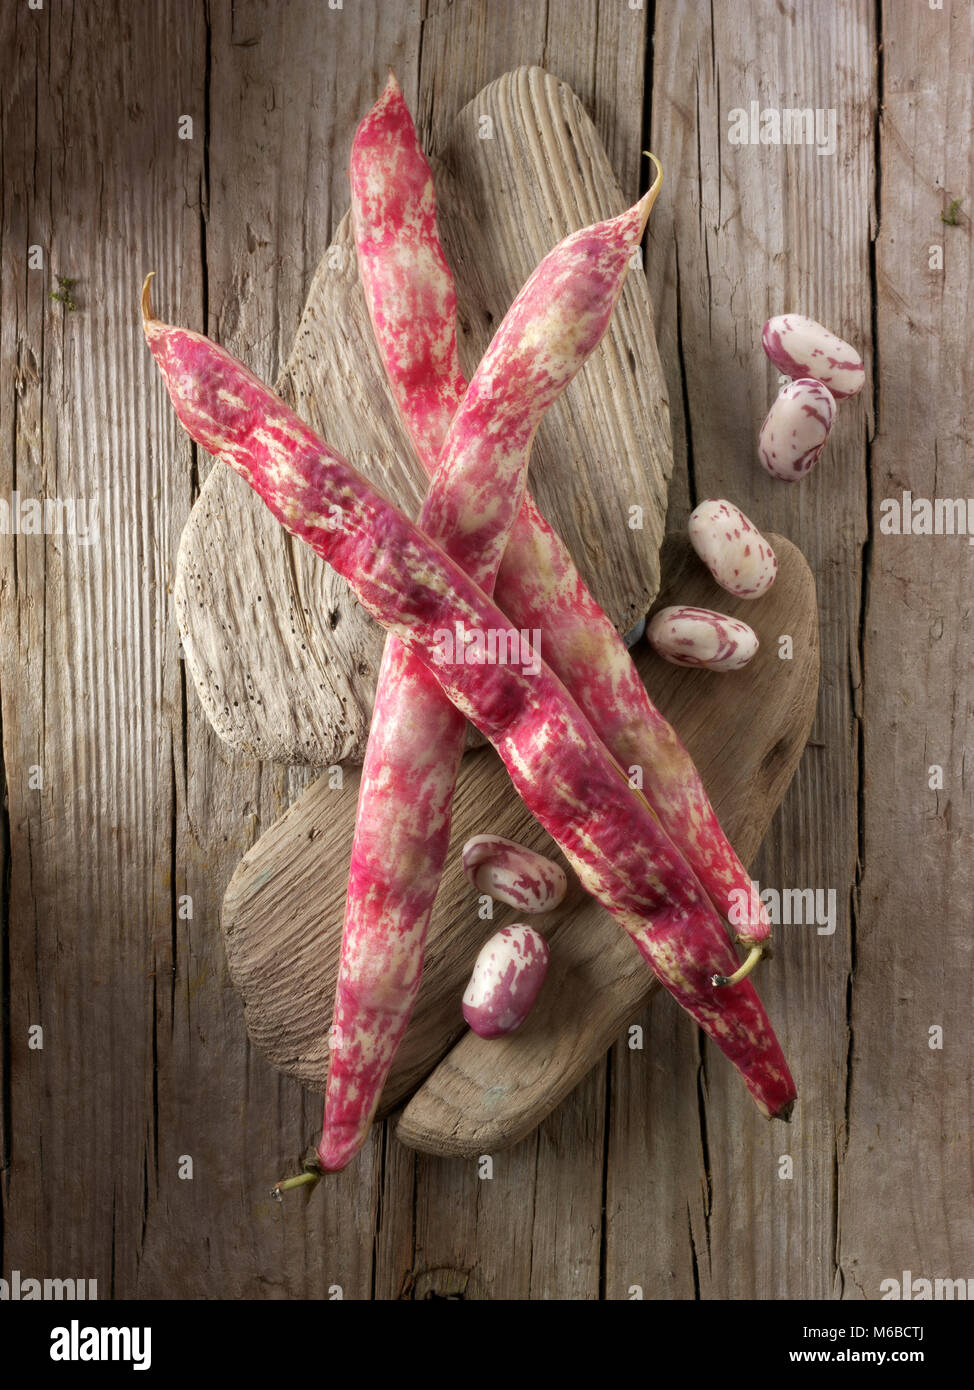 Fresh picked borlotti beans  also known as the cranberry bean or Roman bean - Stock Image